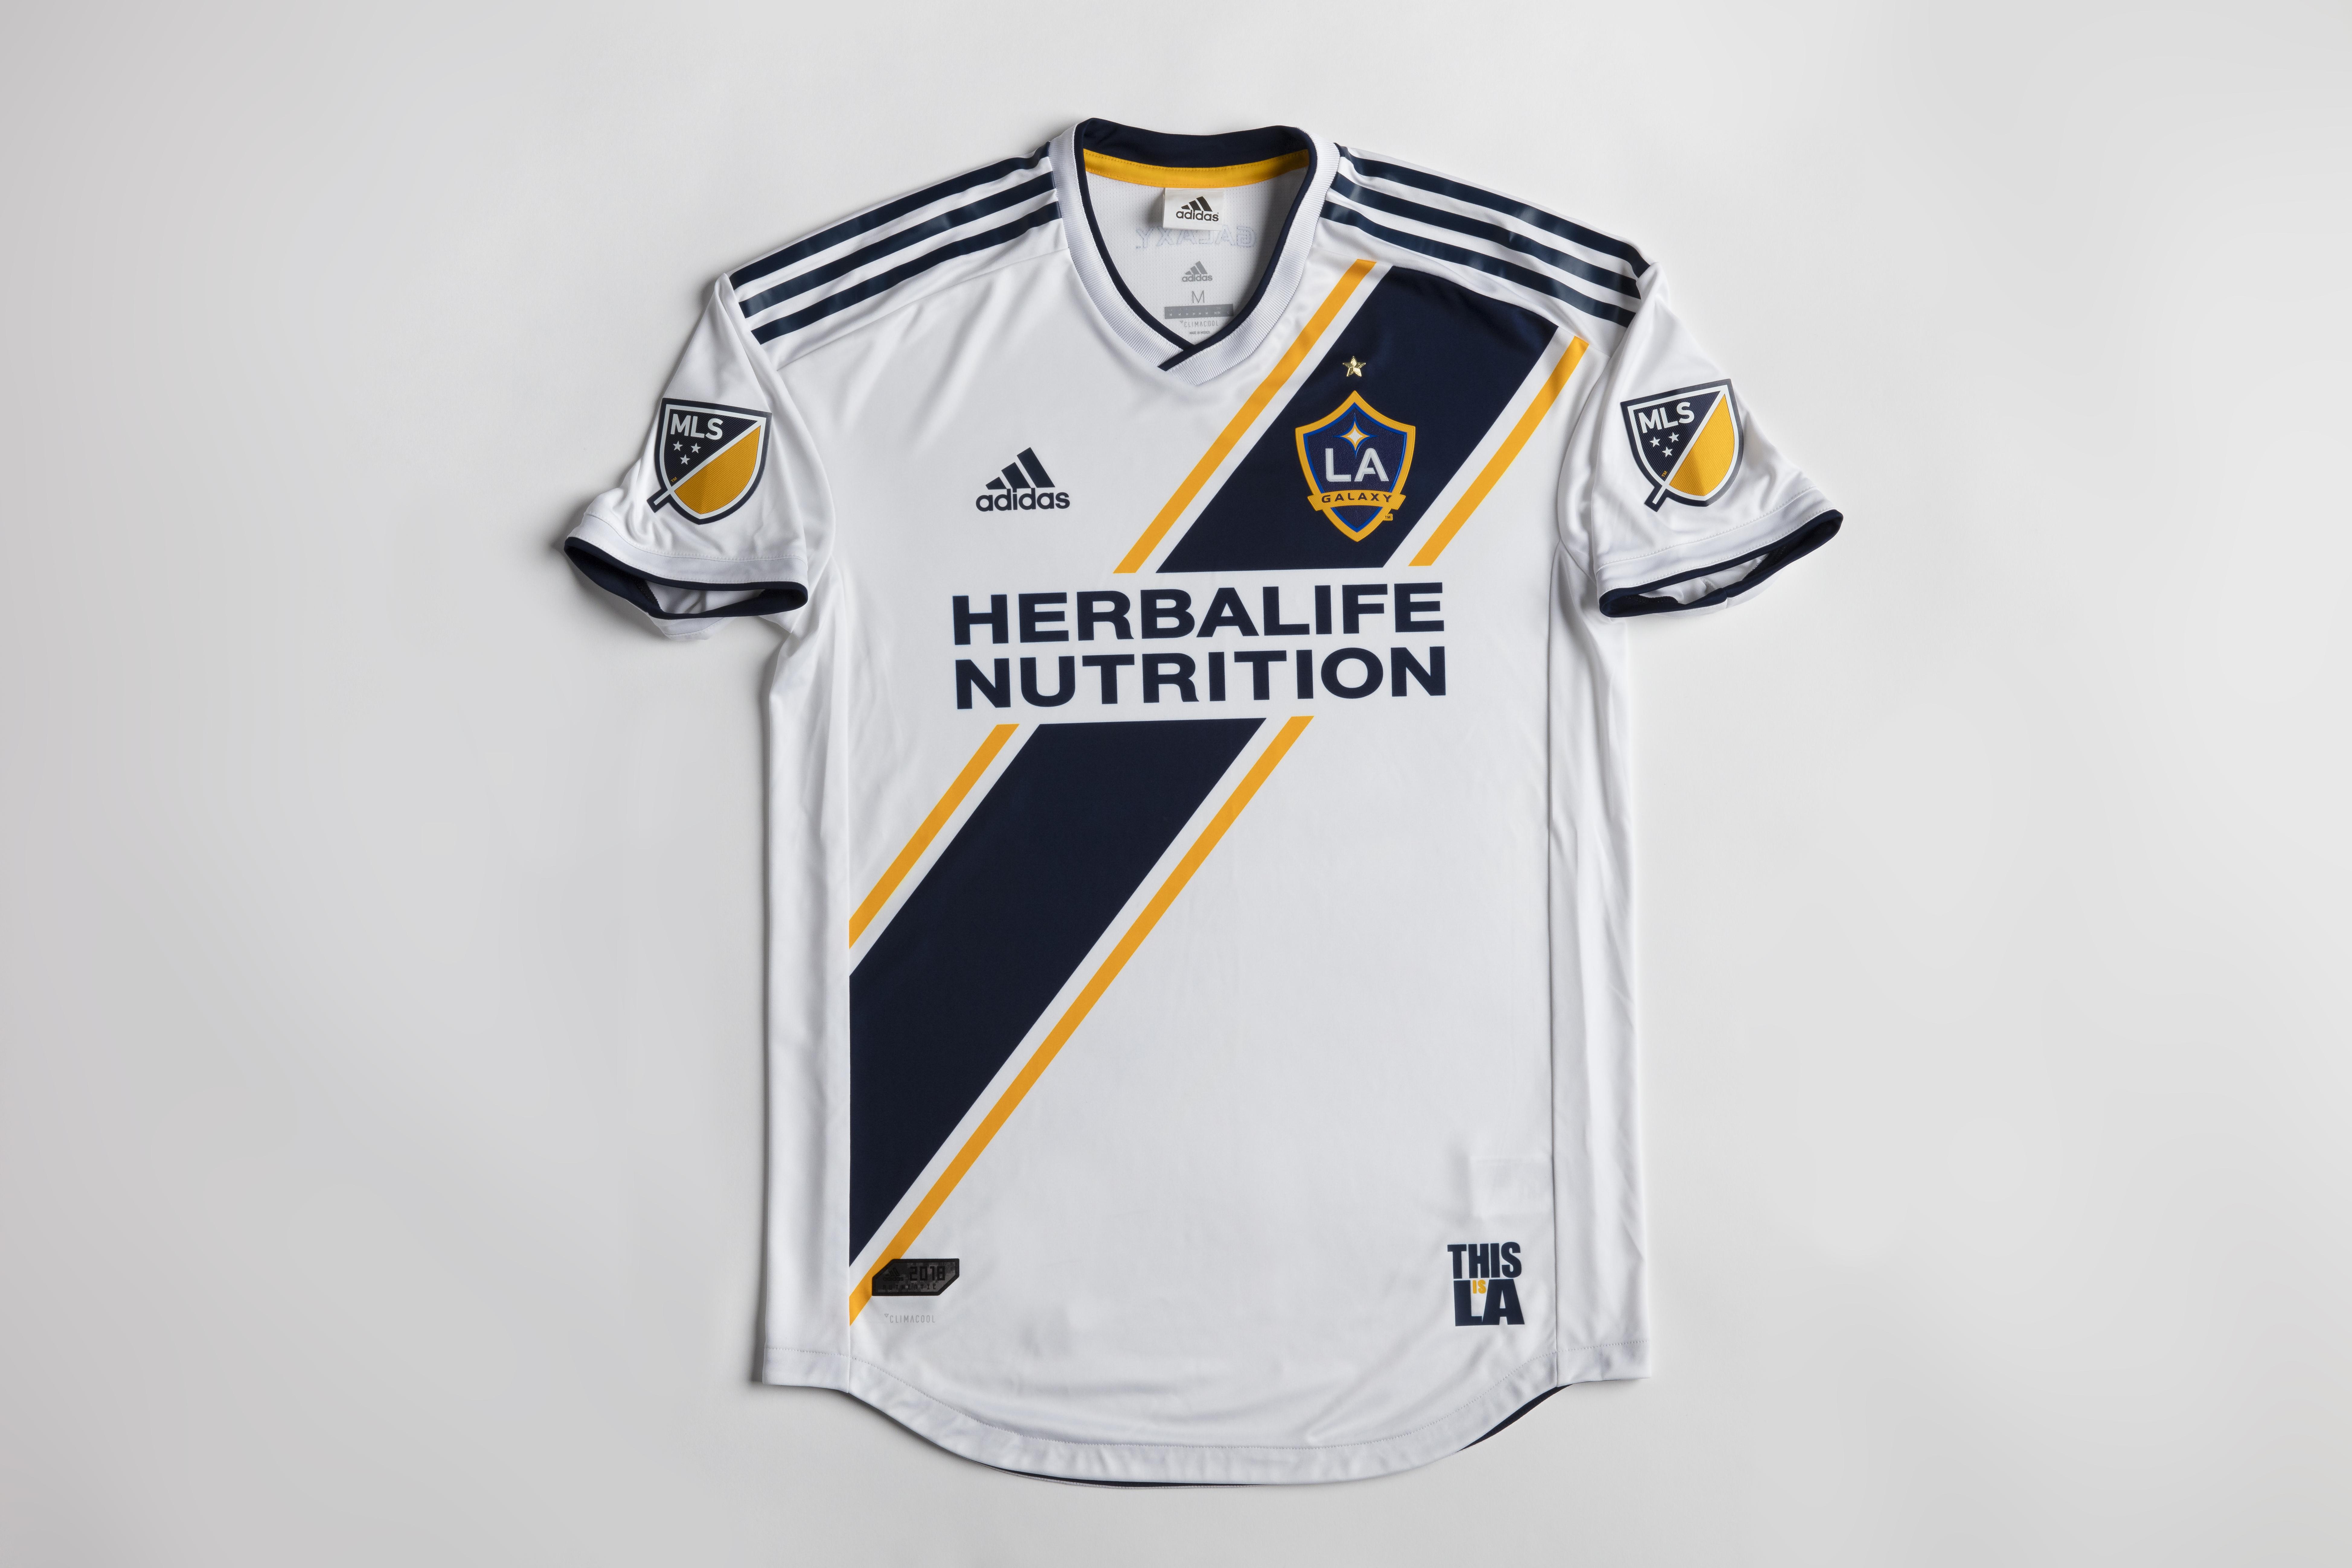 low priced 8b56c bcfdb galaxy-jersey